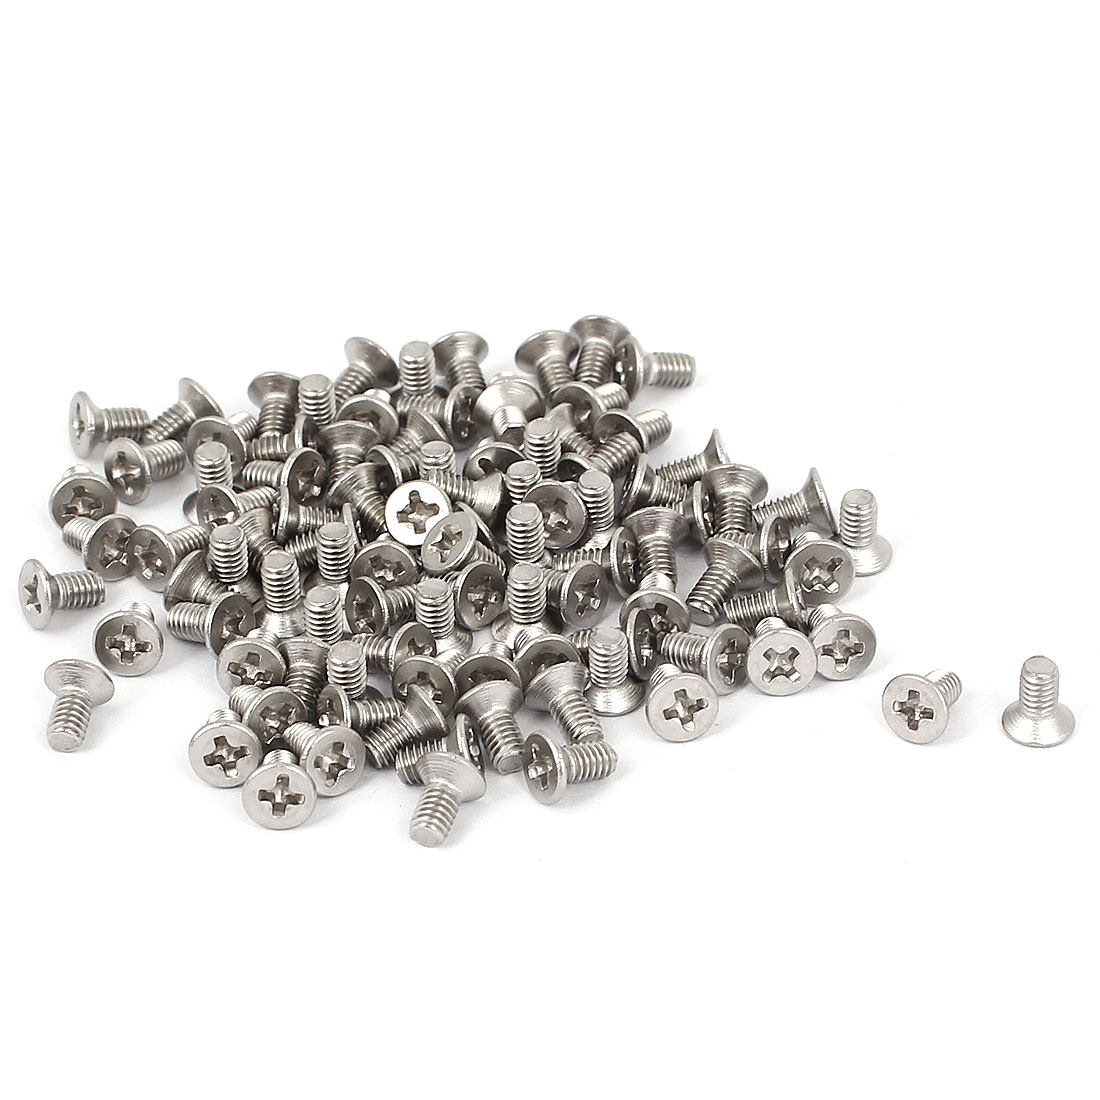 M2.5x5mm Stainless Steel Phillips Flat Countersunk Head Screws 100pcs